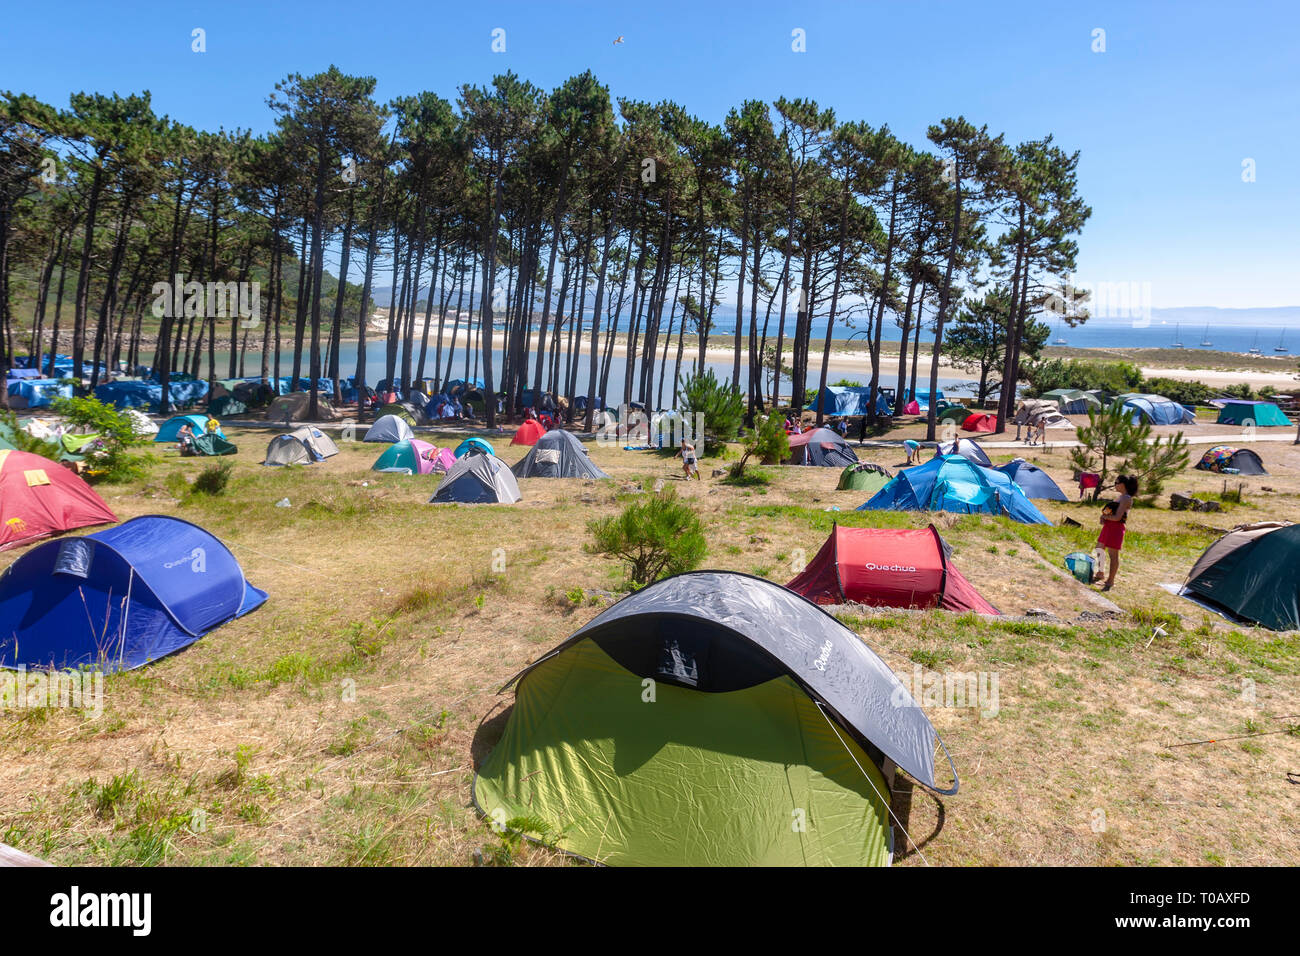 camping-site-in-playa-de-rodas-ces-islan